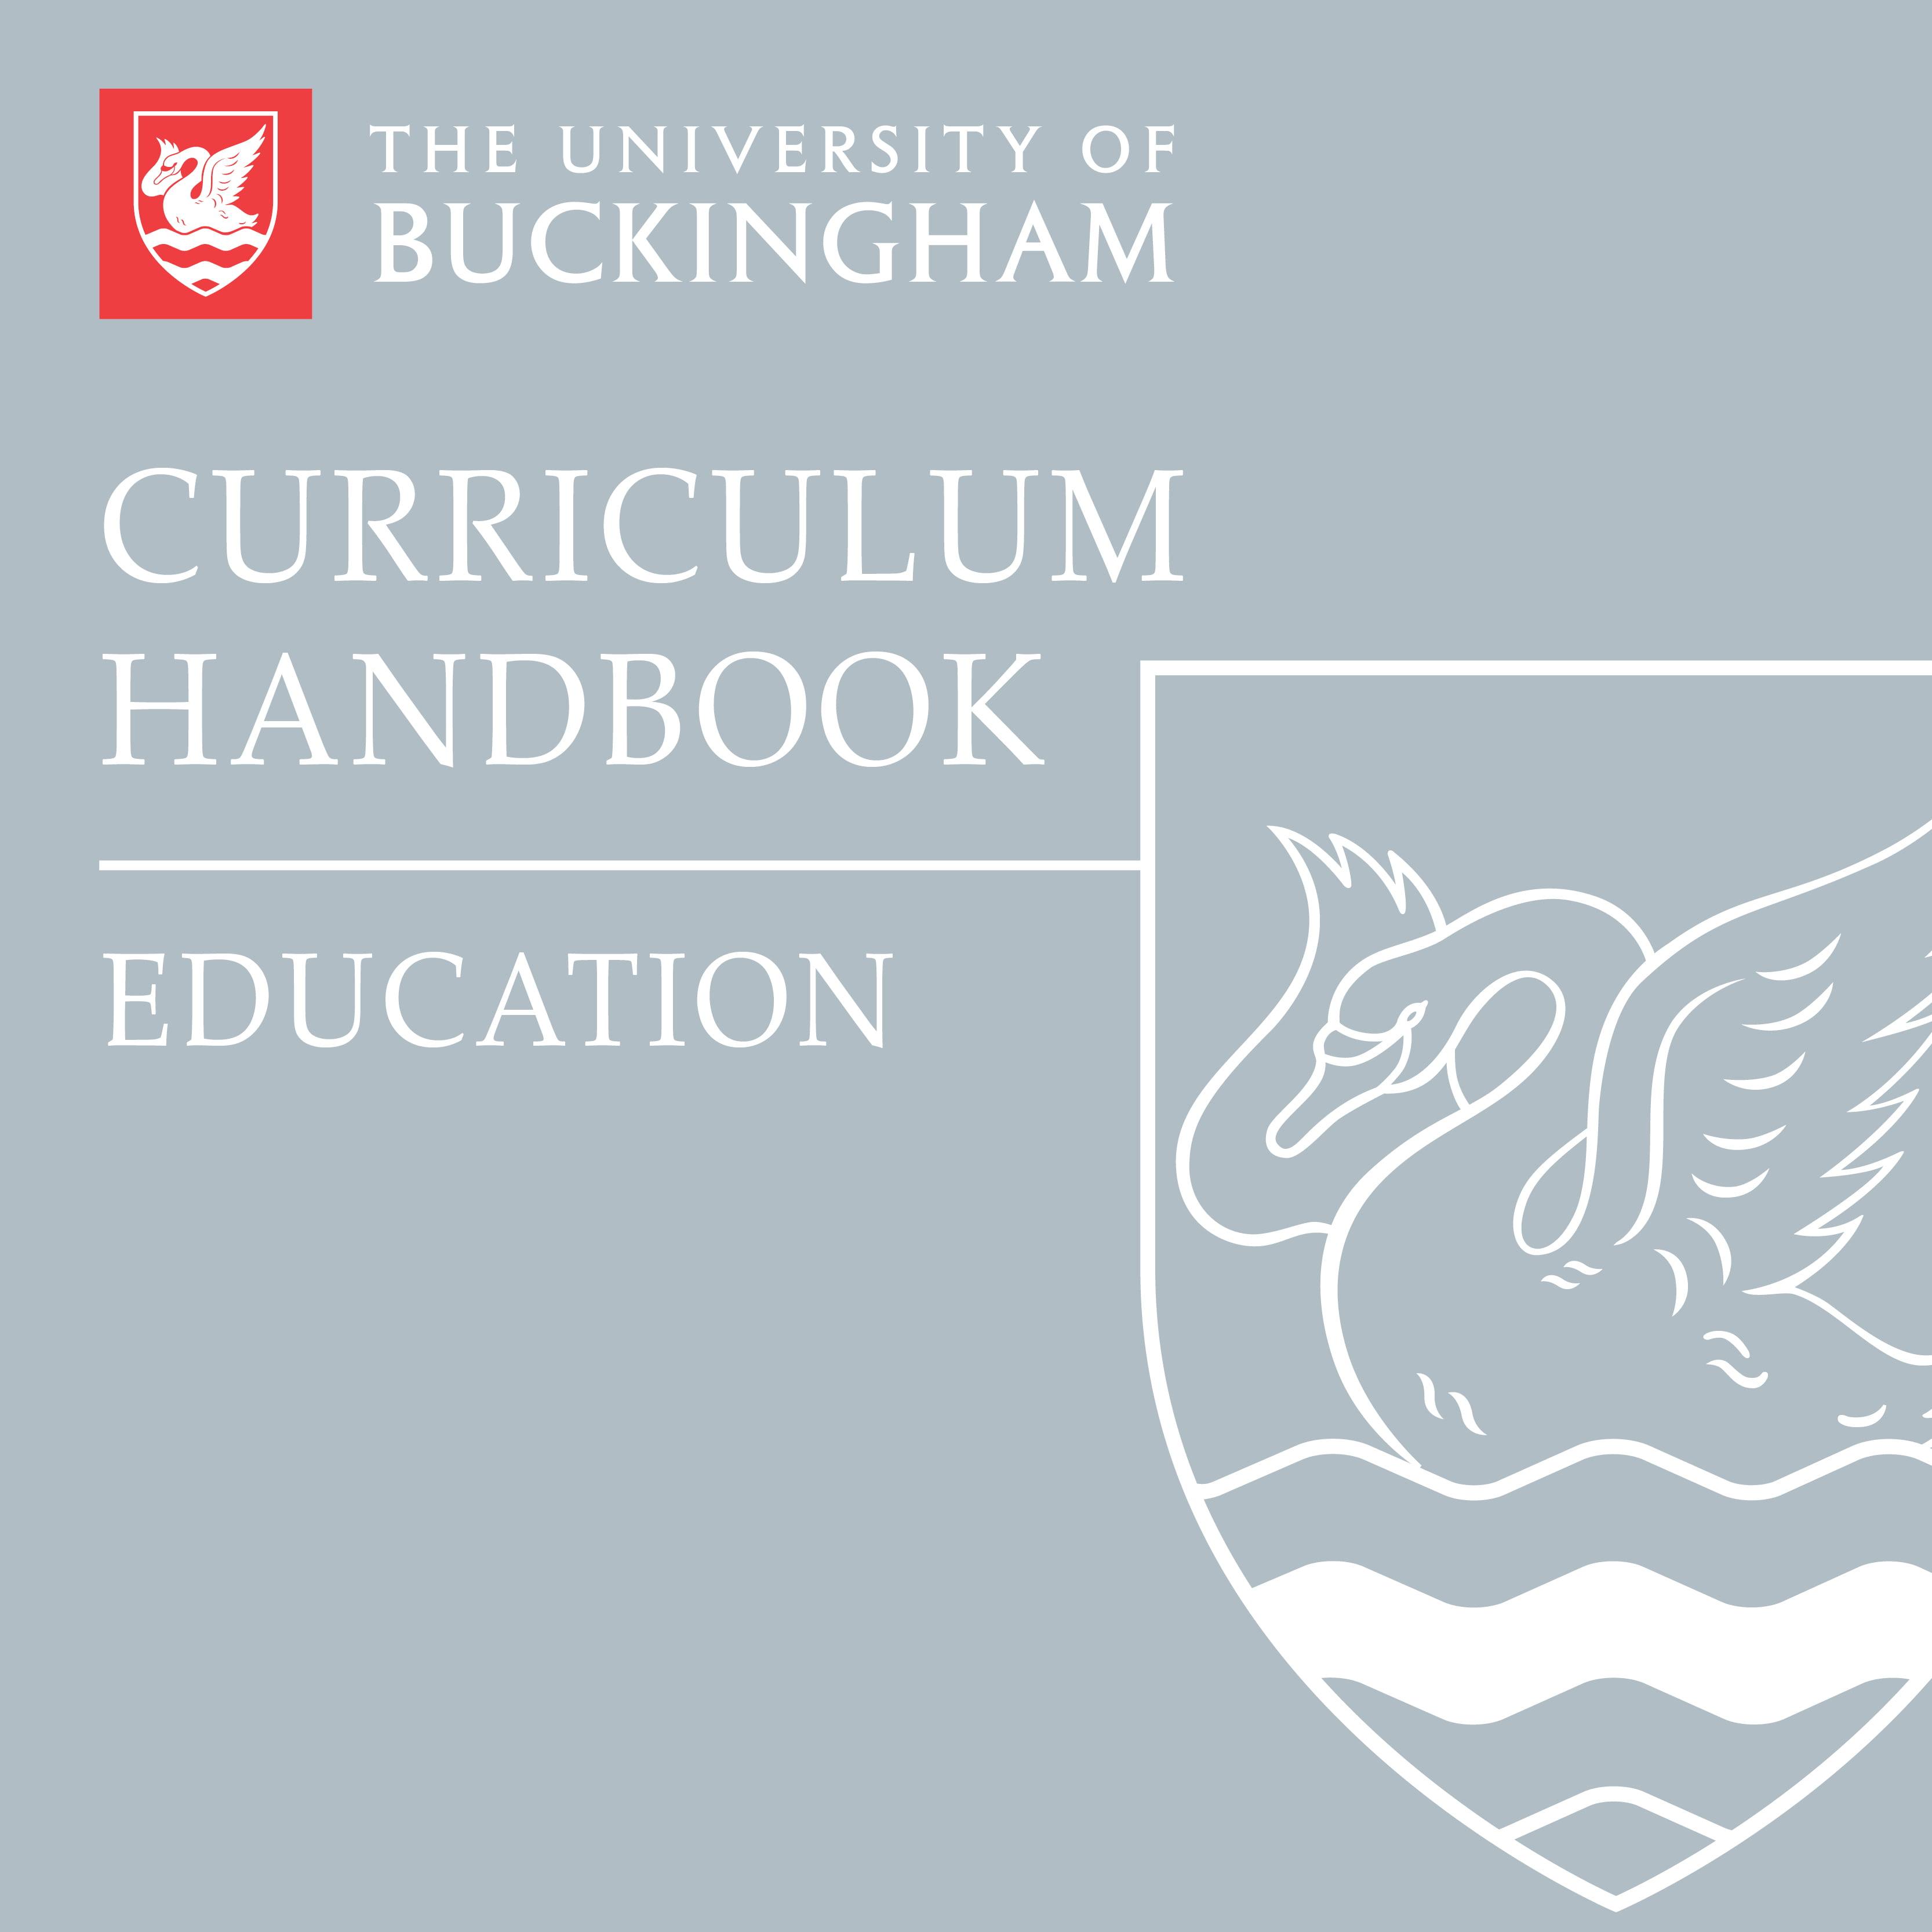 Curriculum Handbook - Education - front cover - online